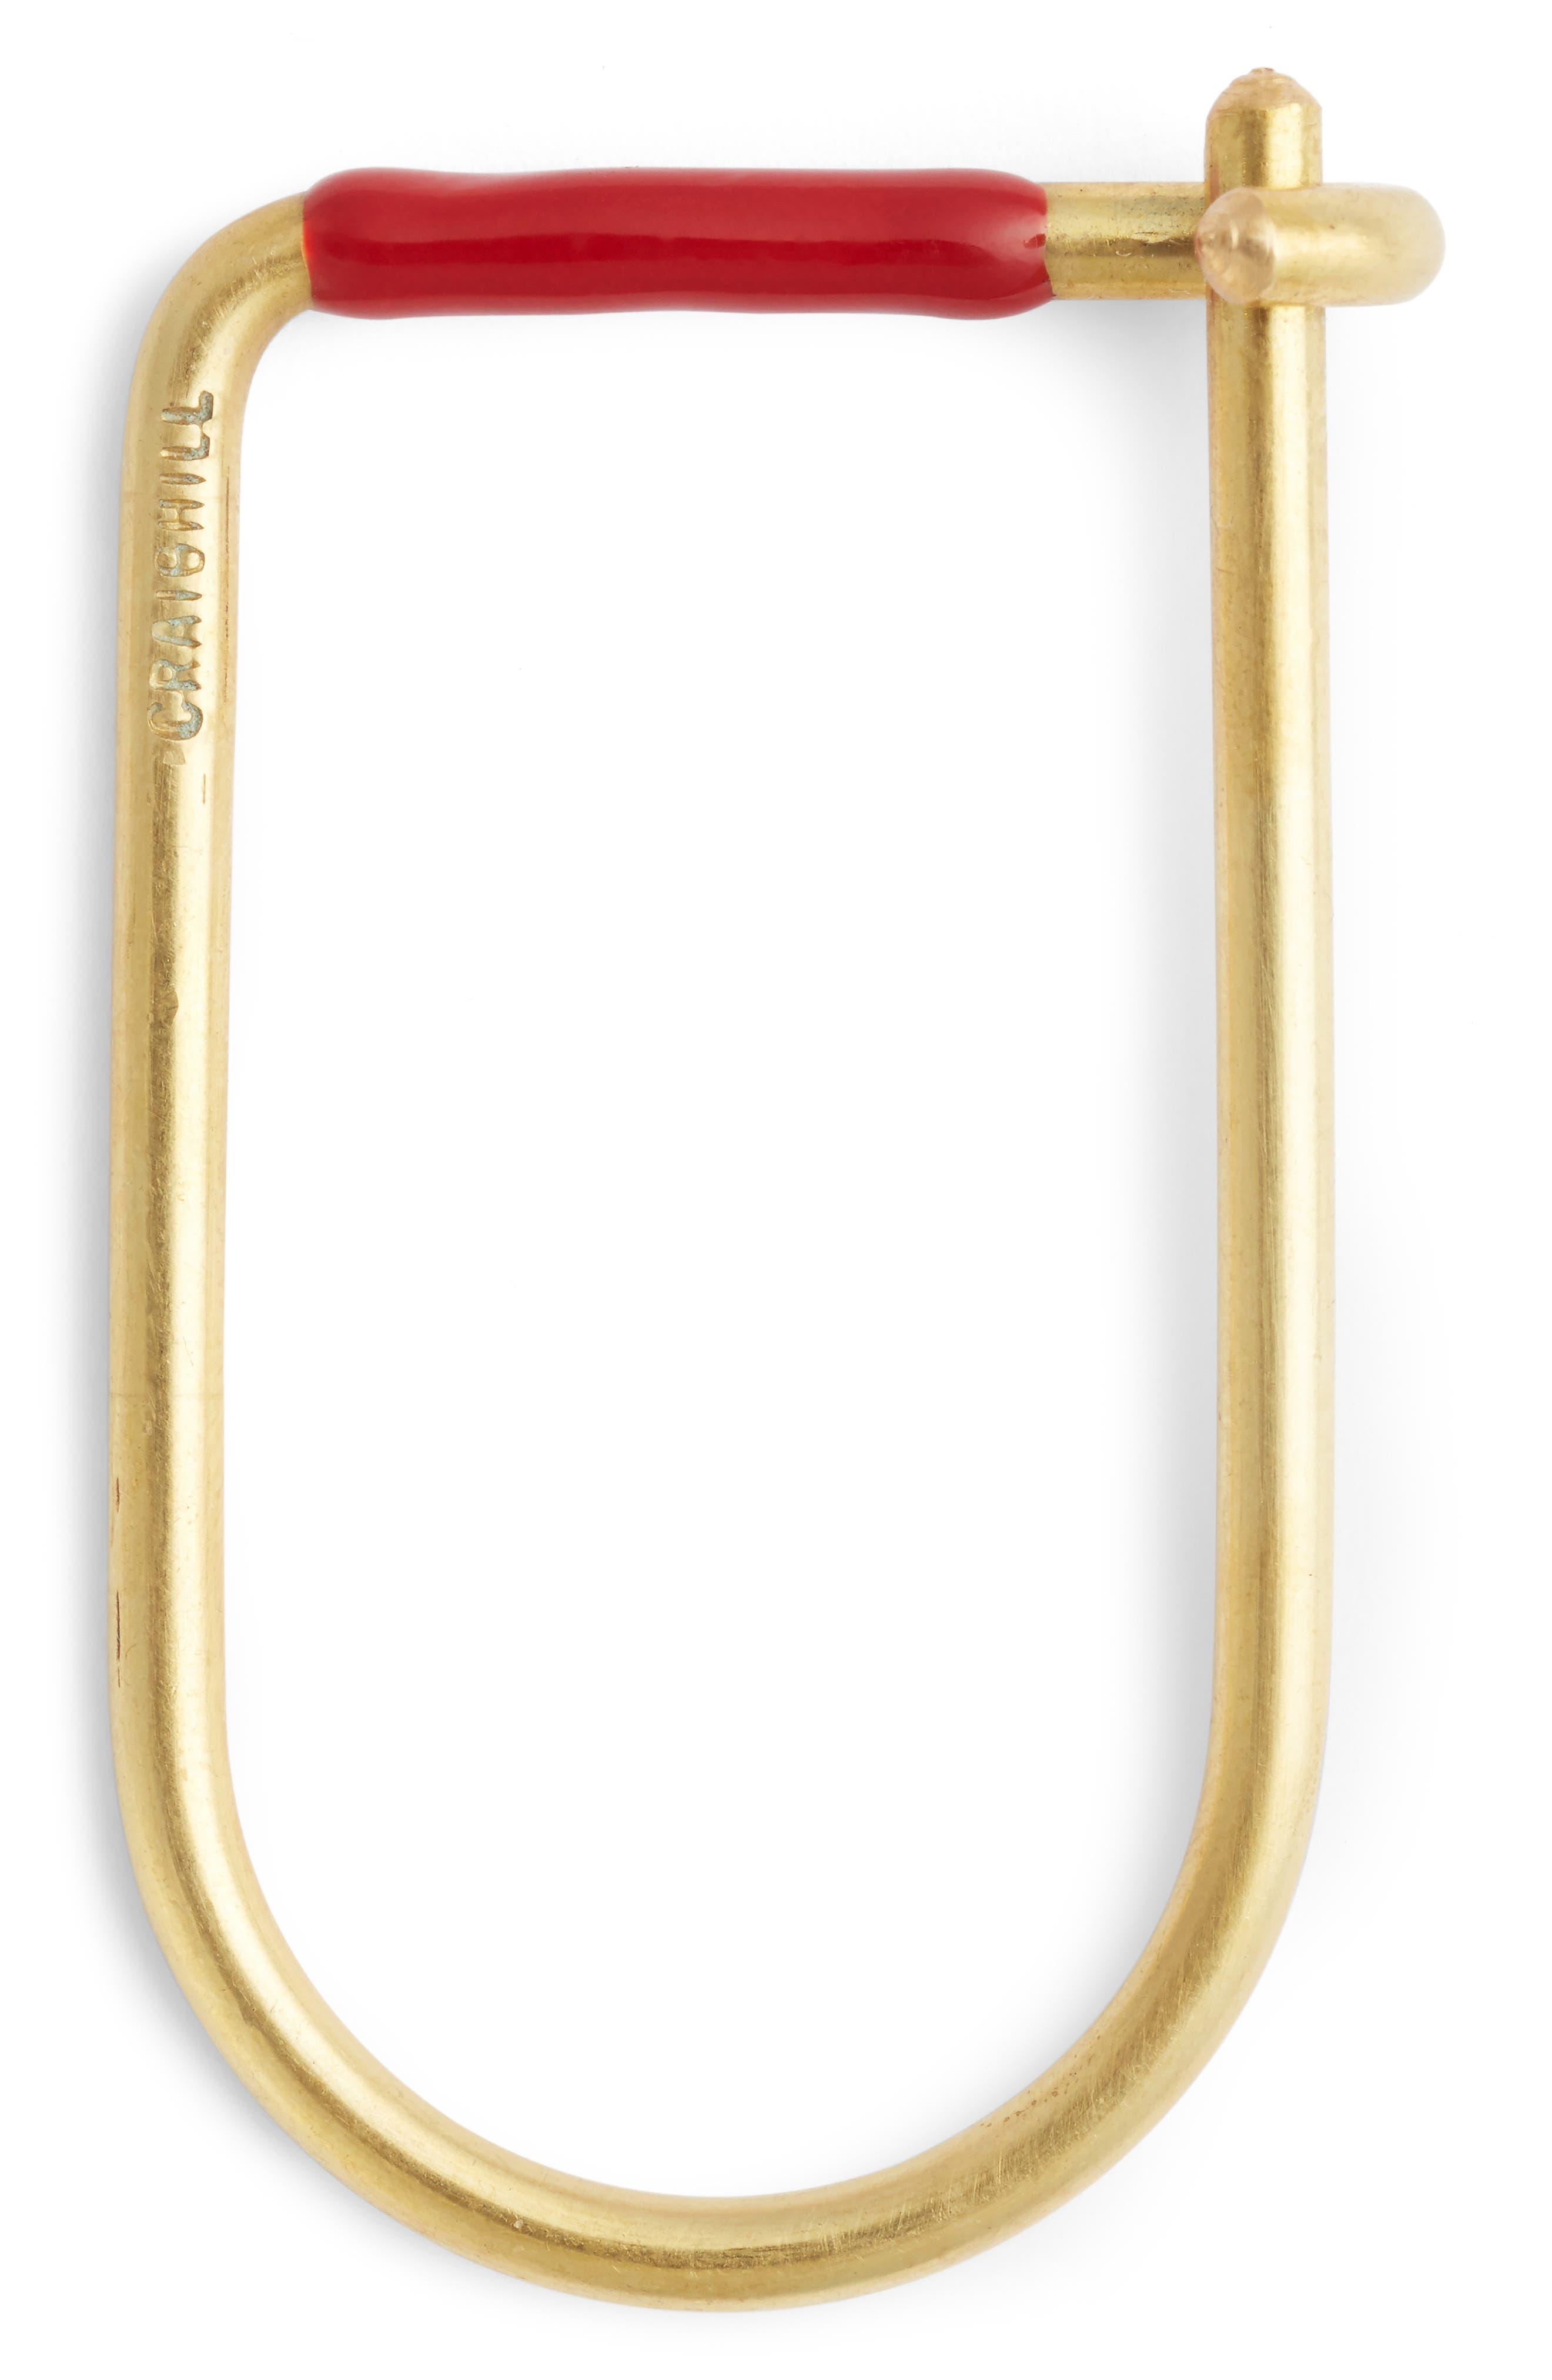 Wilson Enameled Brass Key Ring,                             Main thumbnail 4, color,